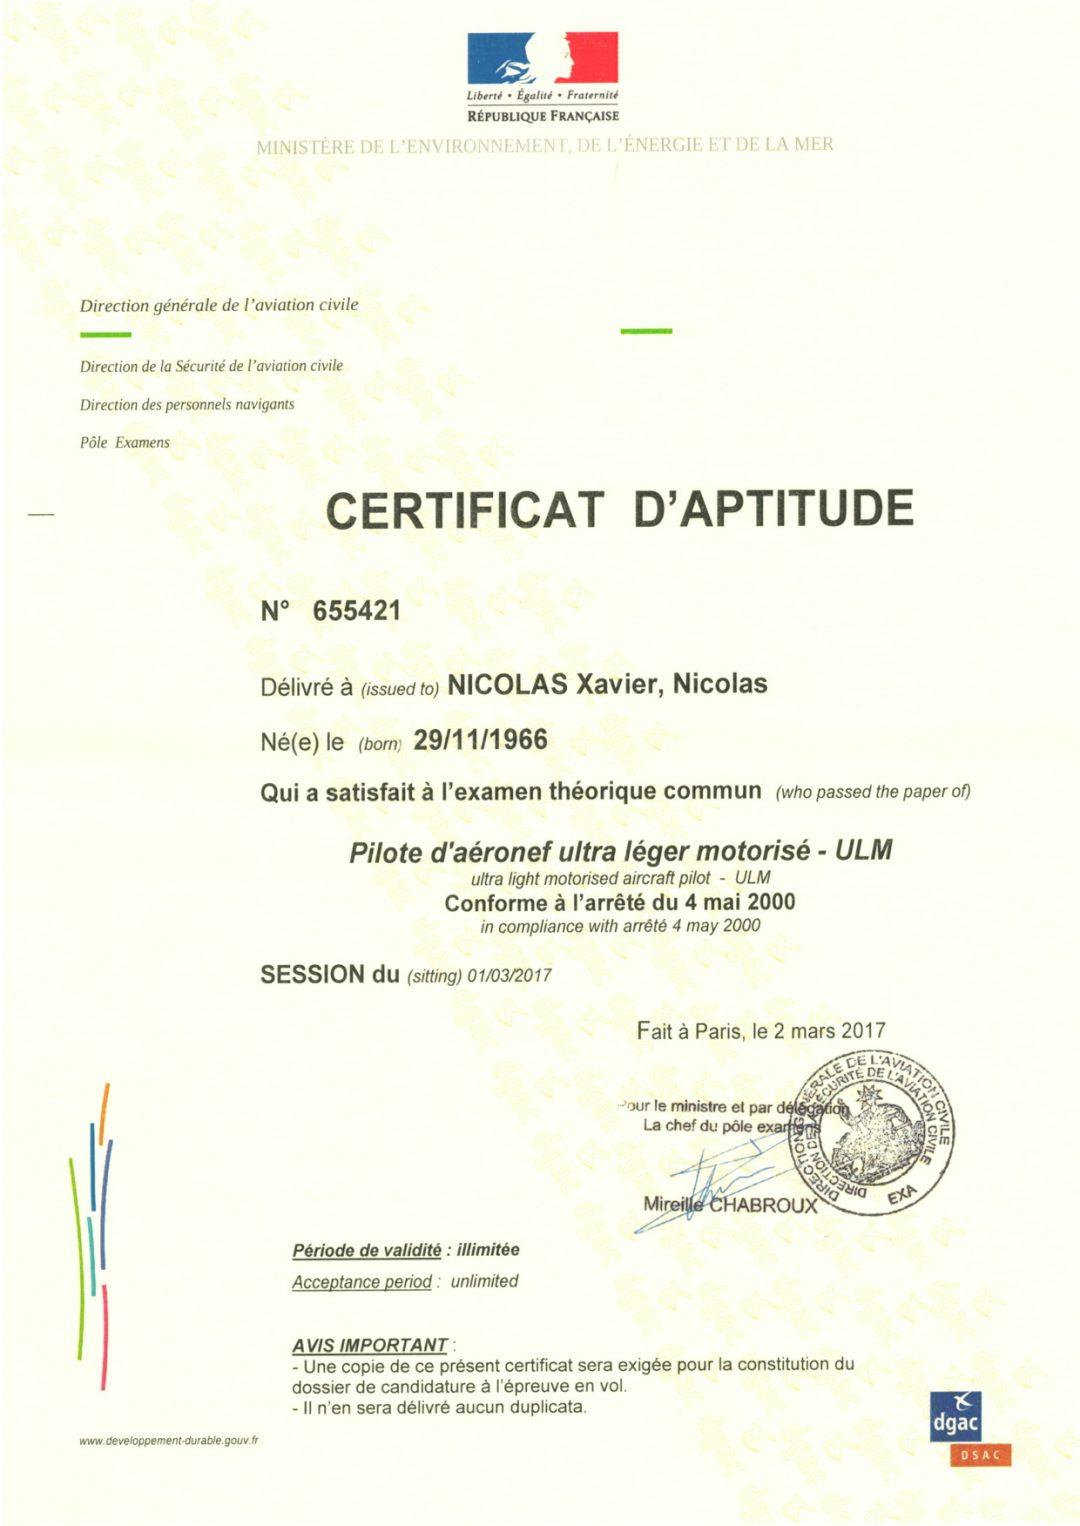 Certificat d'aptitude - Pilote d'aéronef ultra léger